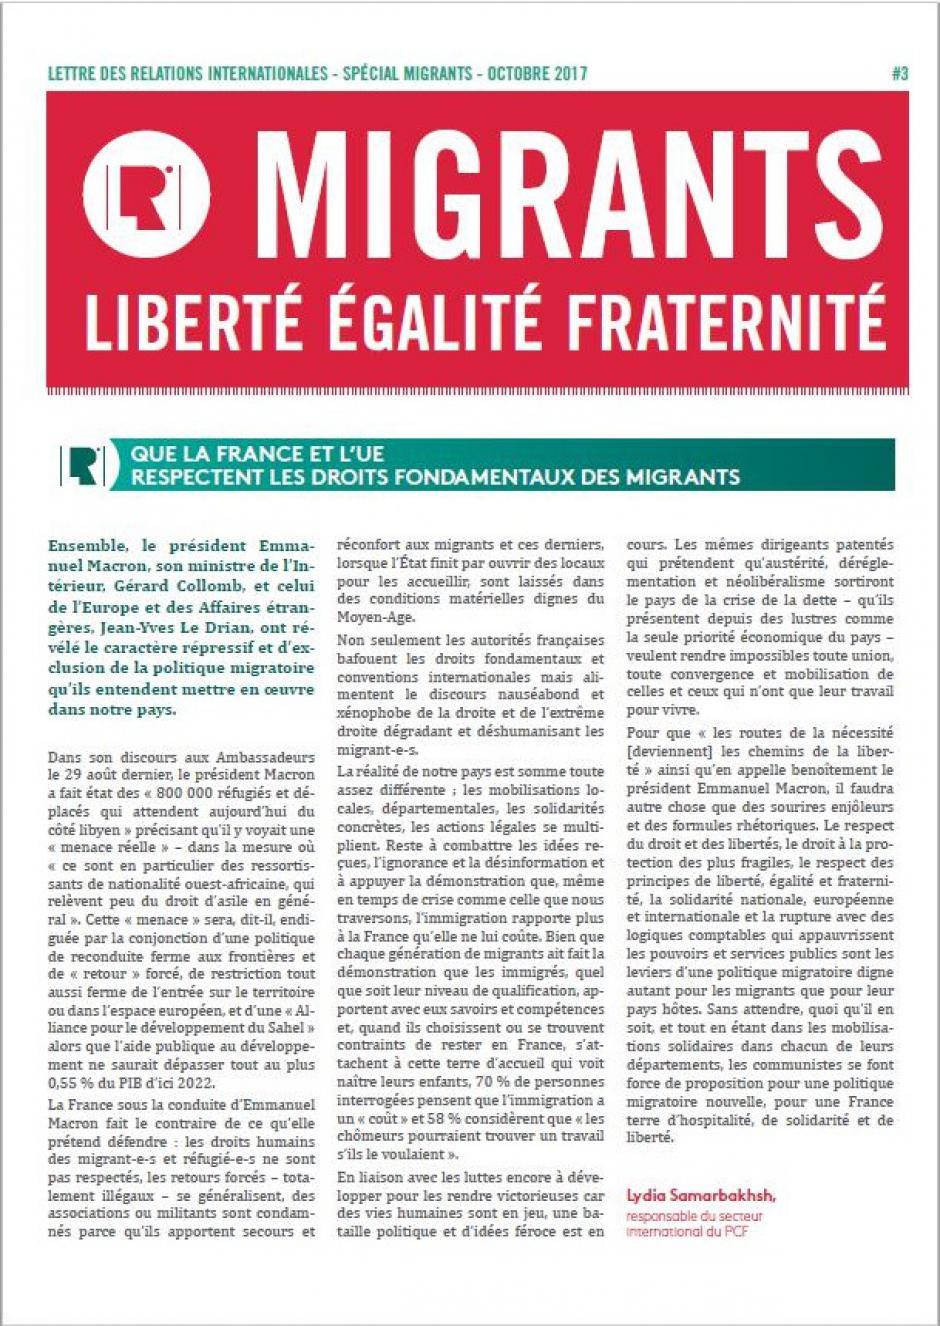 Que la France et l'UE respectent les droits fondamentaux des migrants